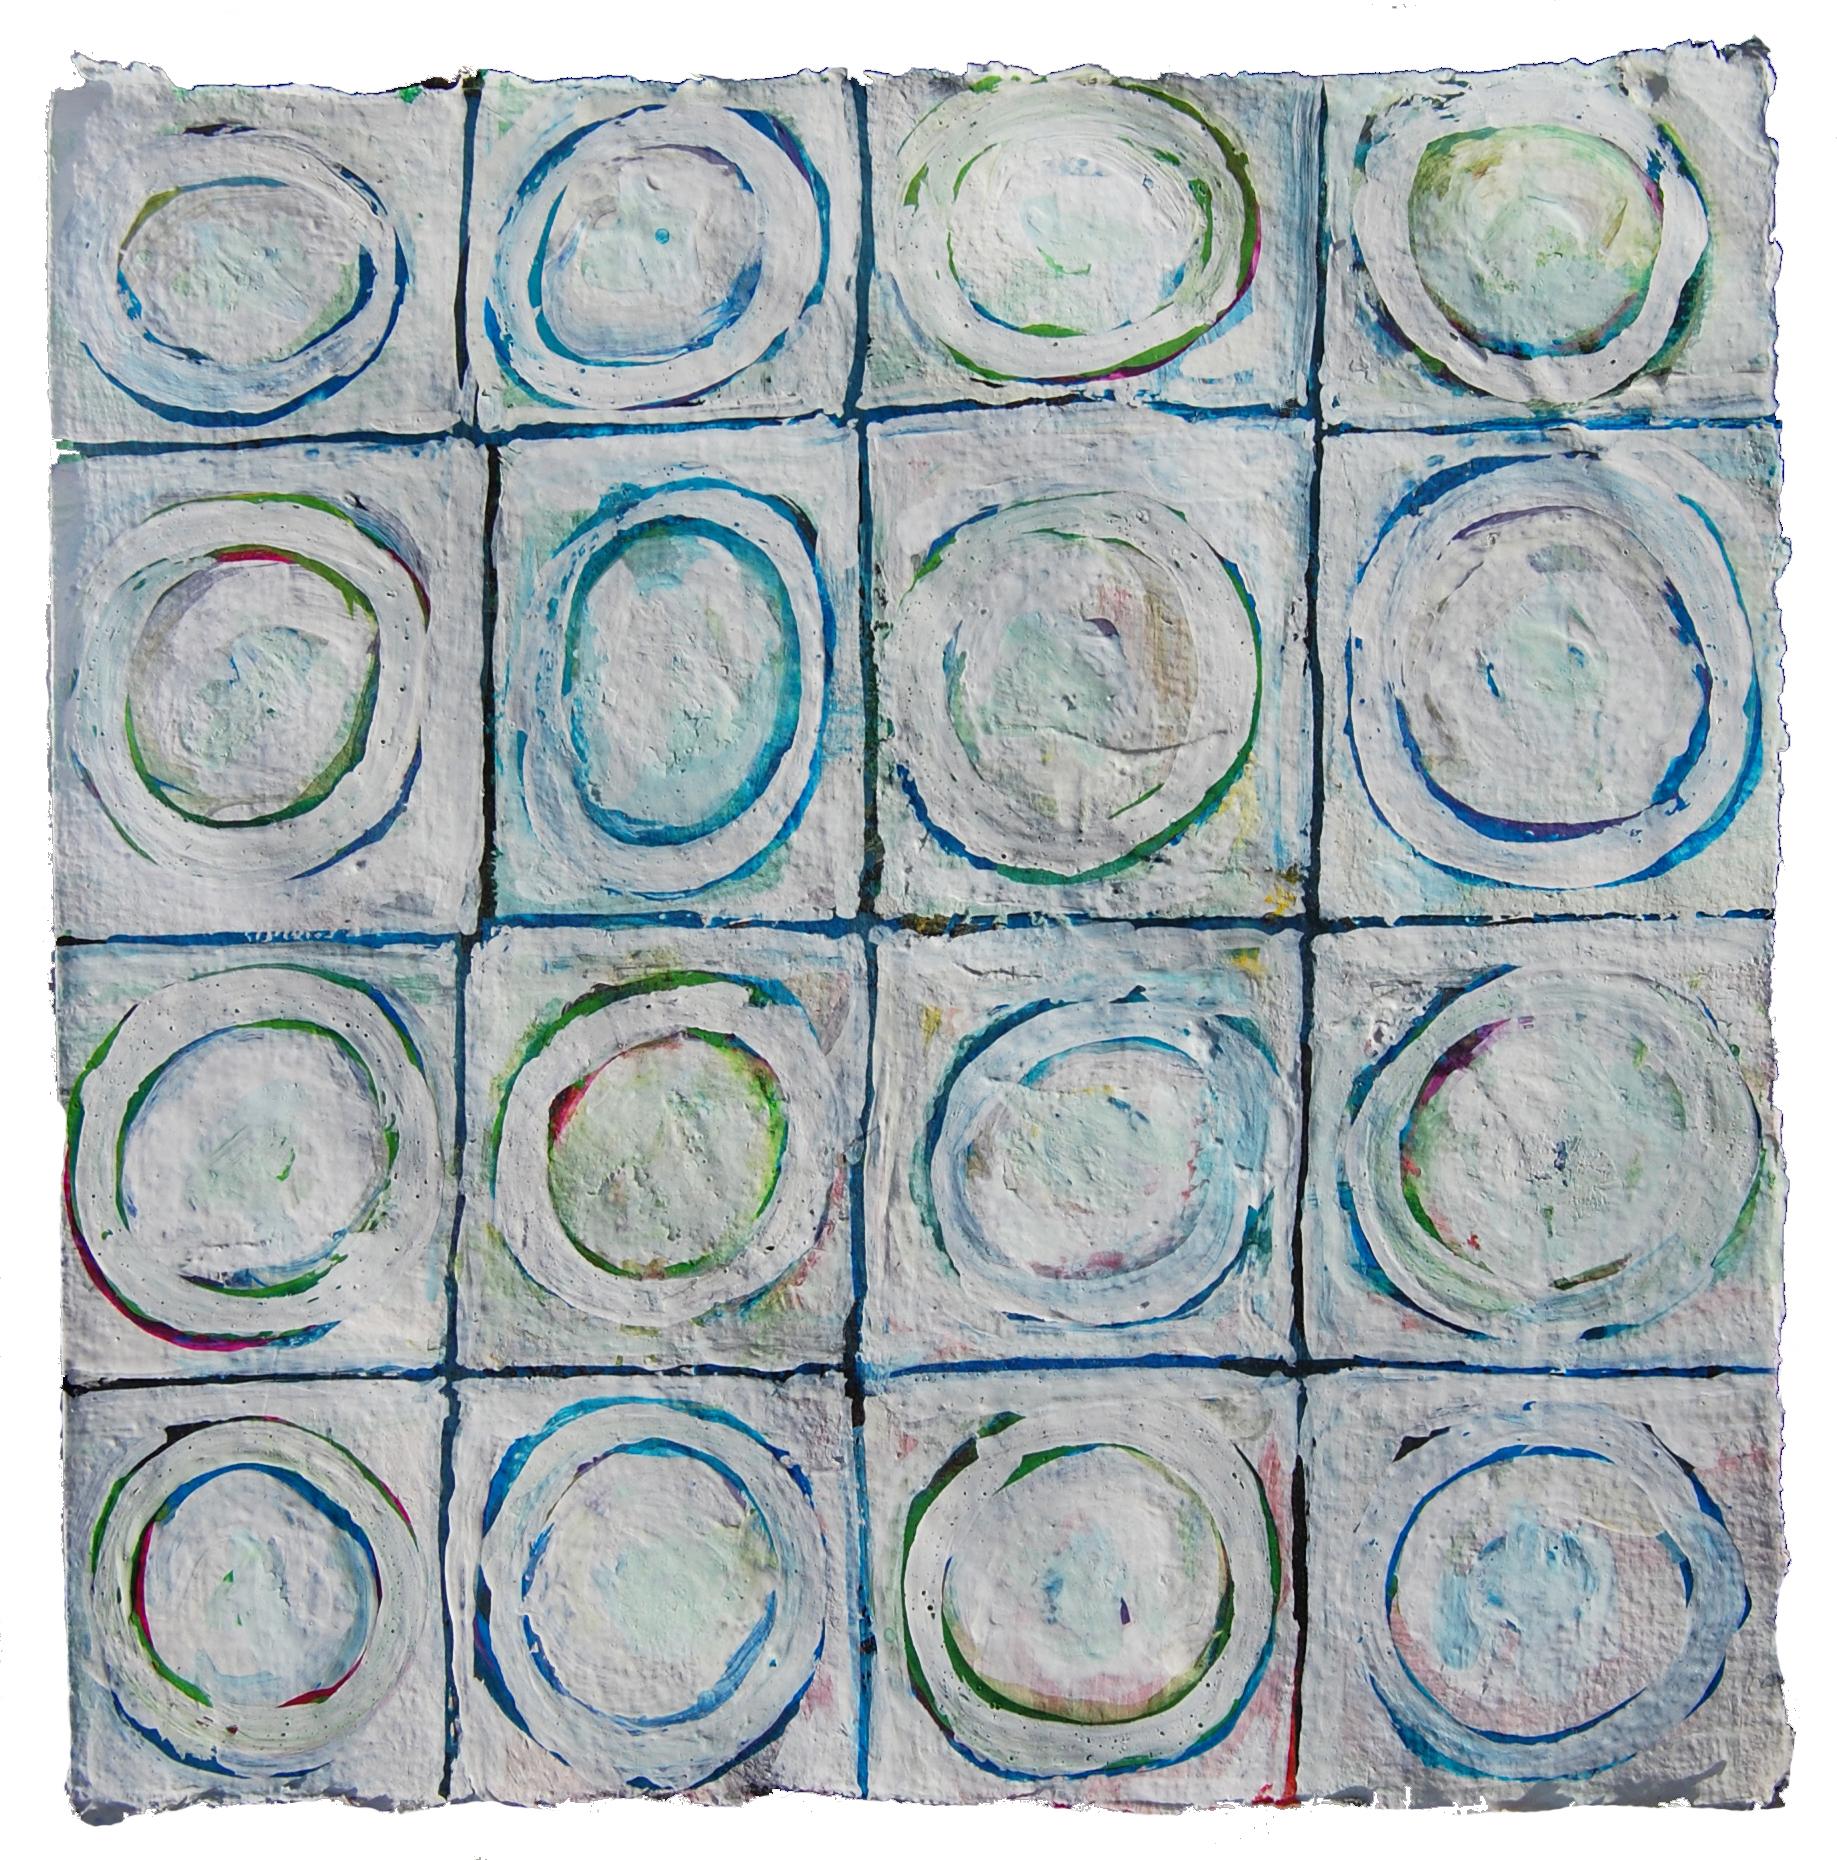 Untitled (Study of circles 2)